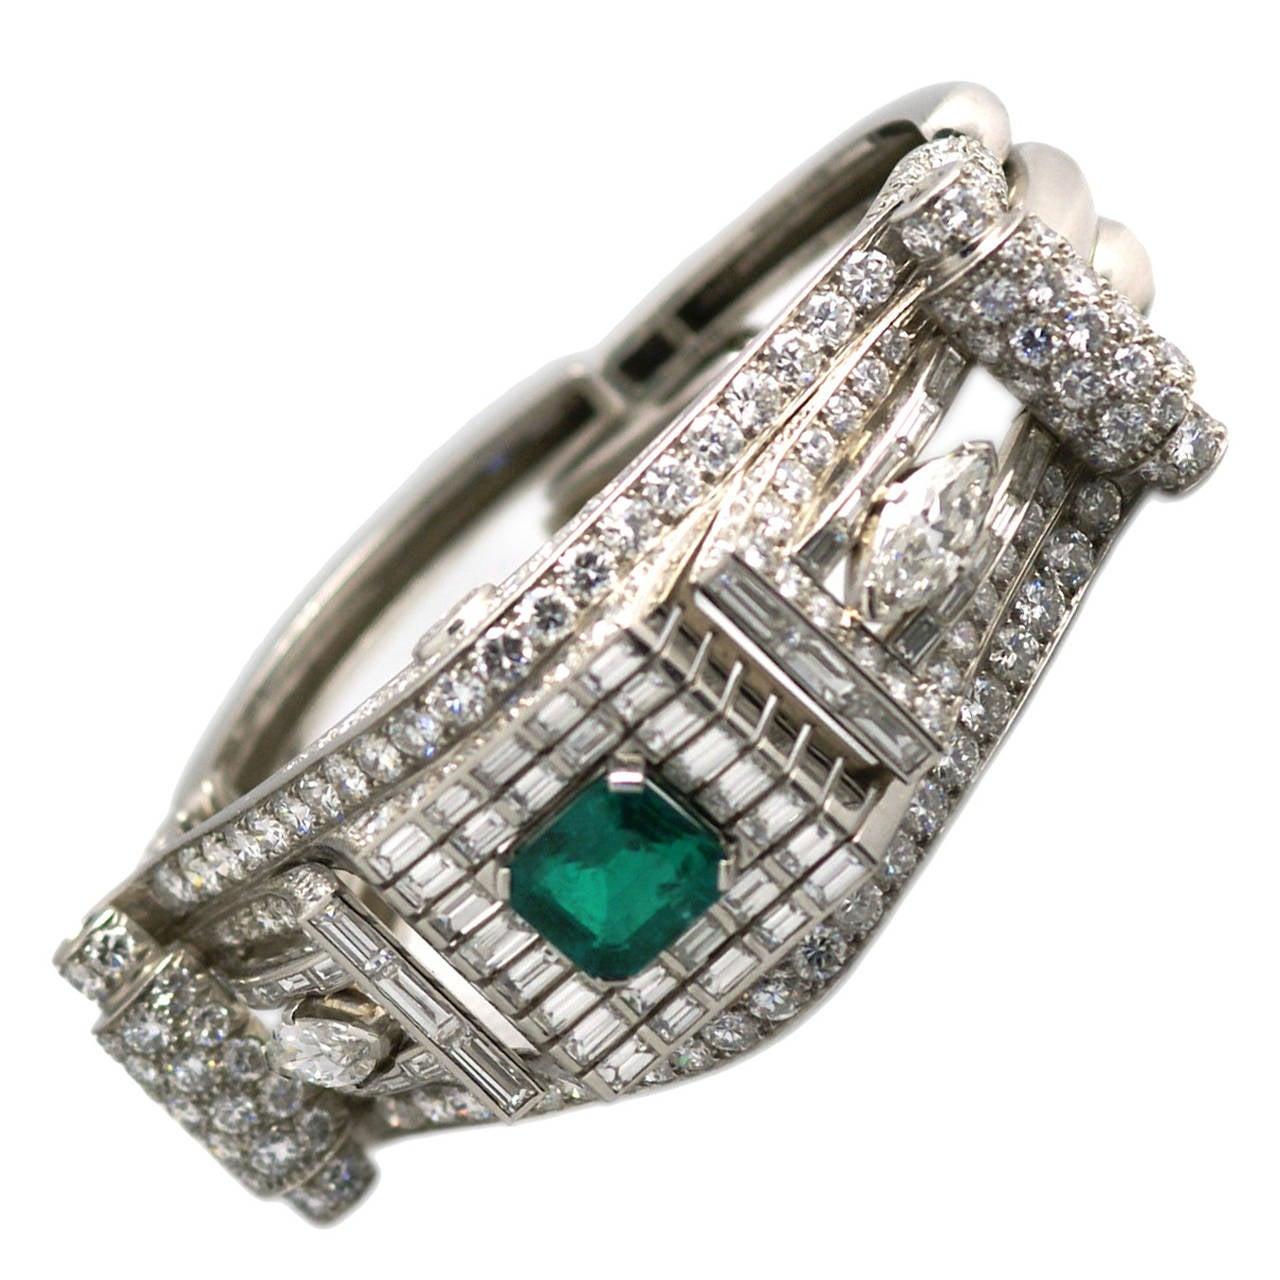 Important 1930s French Emerald Diamond Platinum Bracelet